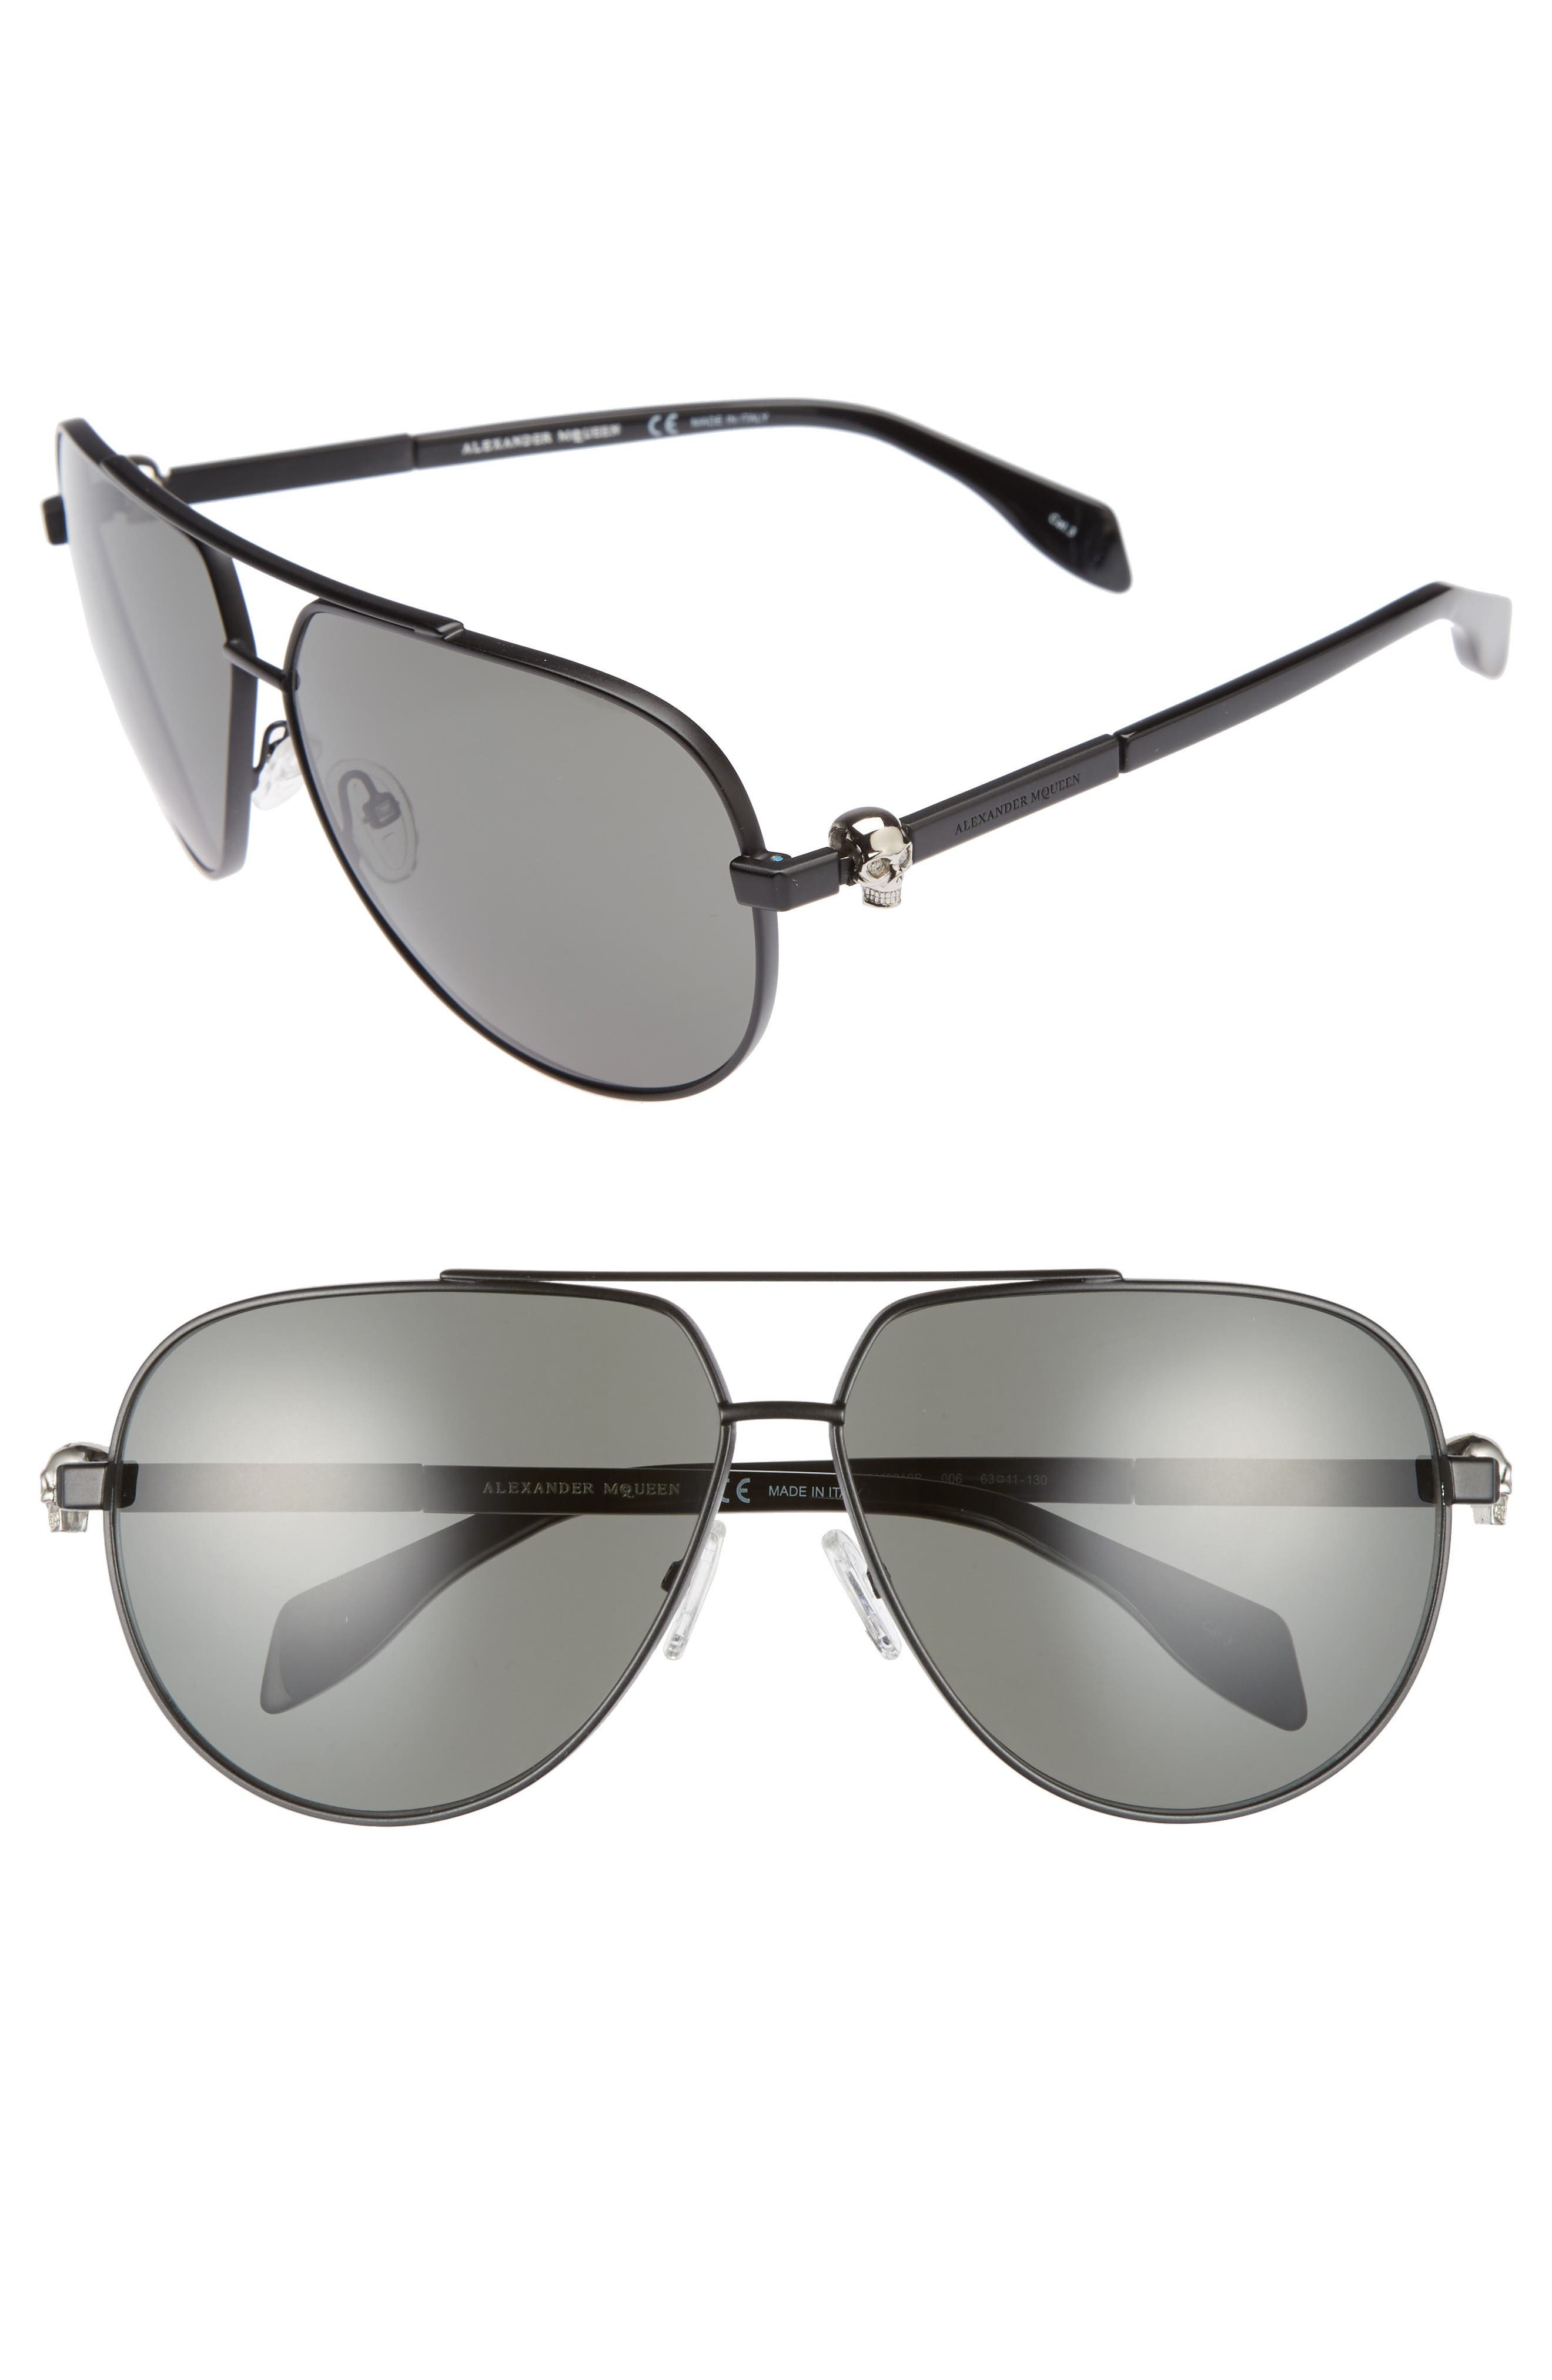 63mm Aviator Sunglasses,                         Main,                         color, 001